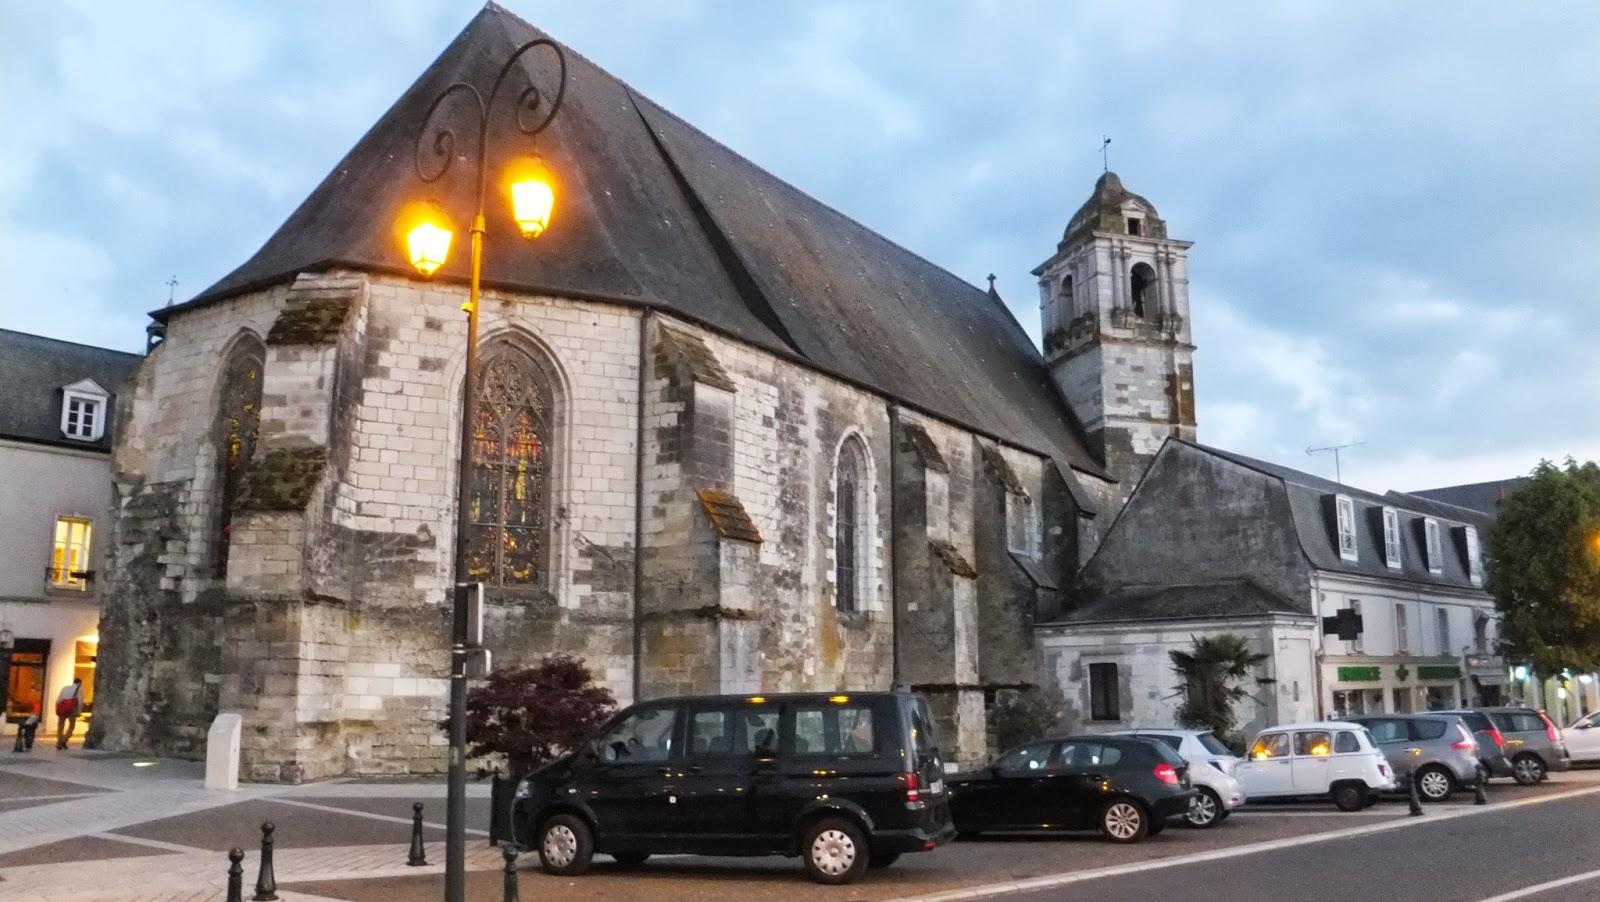 Atardecer en Amboise